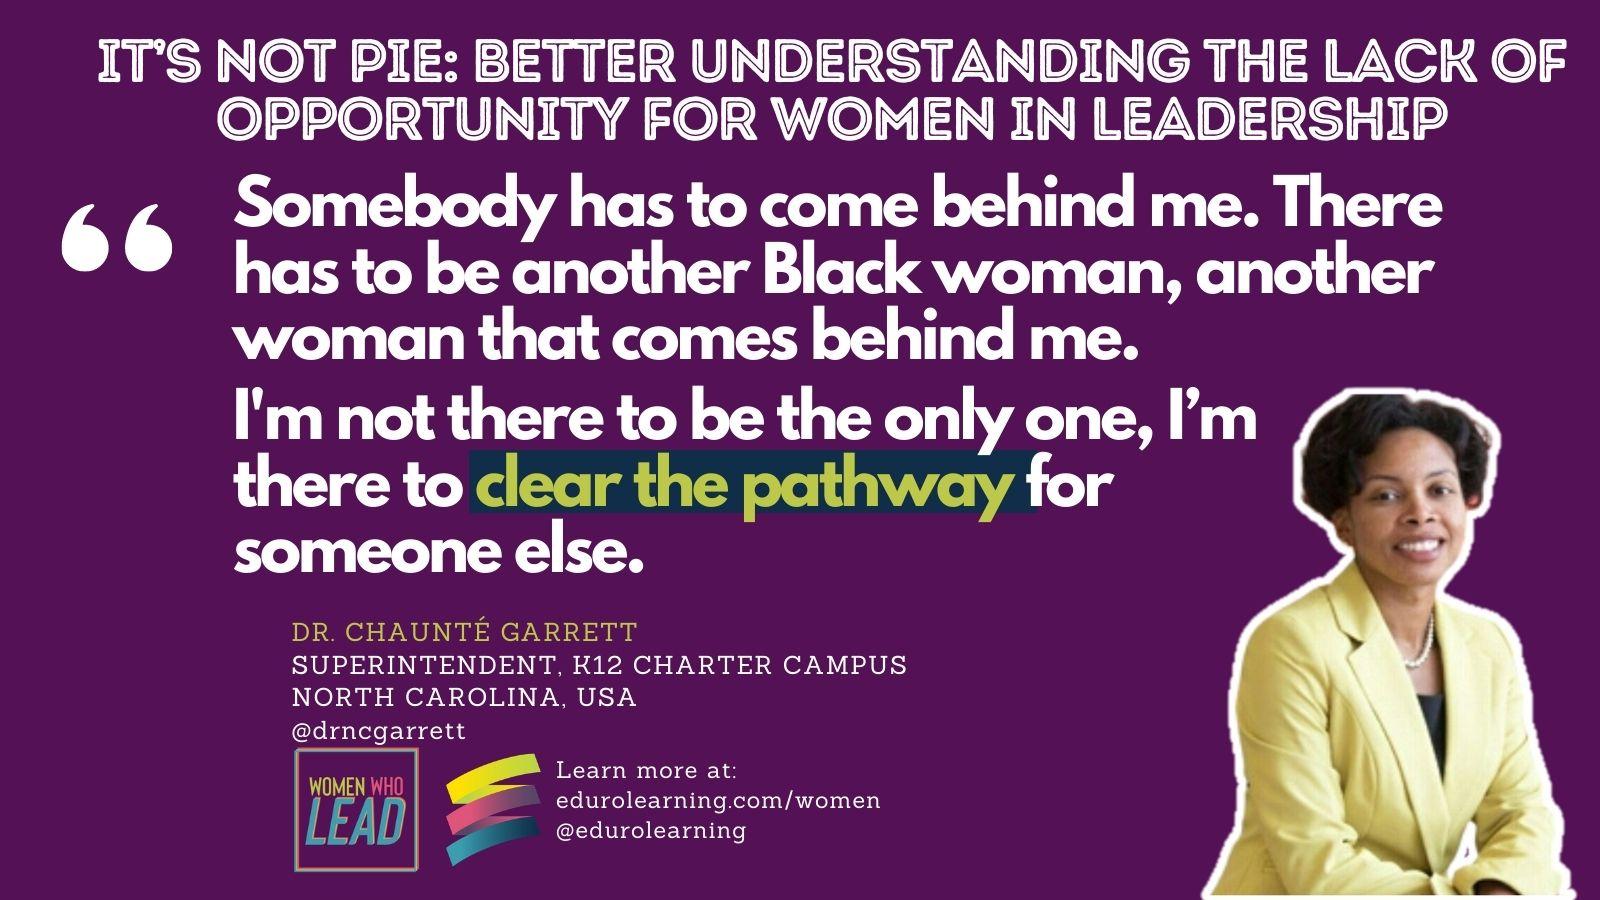 It's Not Pie: Better Understanding the Lack of Opportunity for Women in Leadership